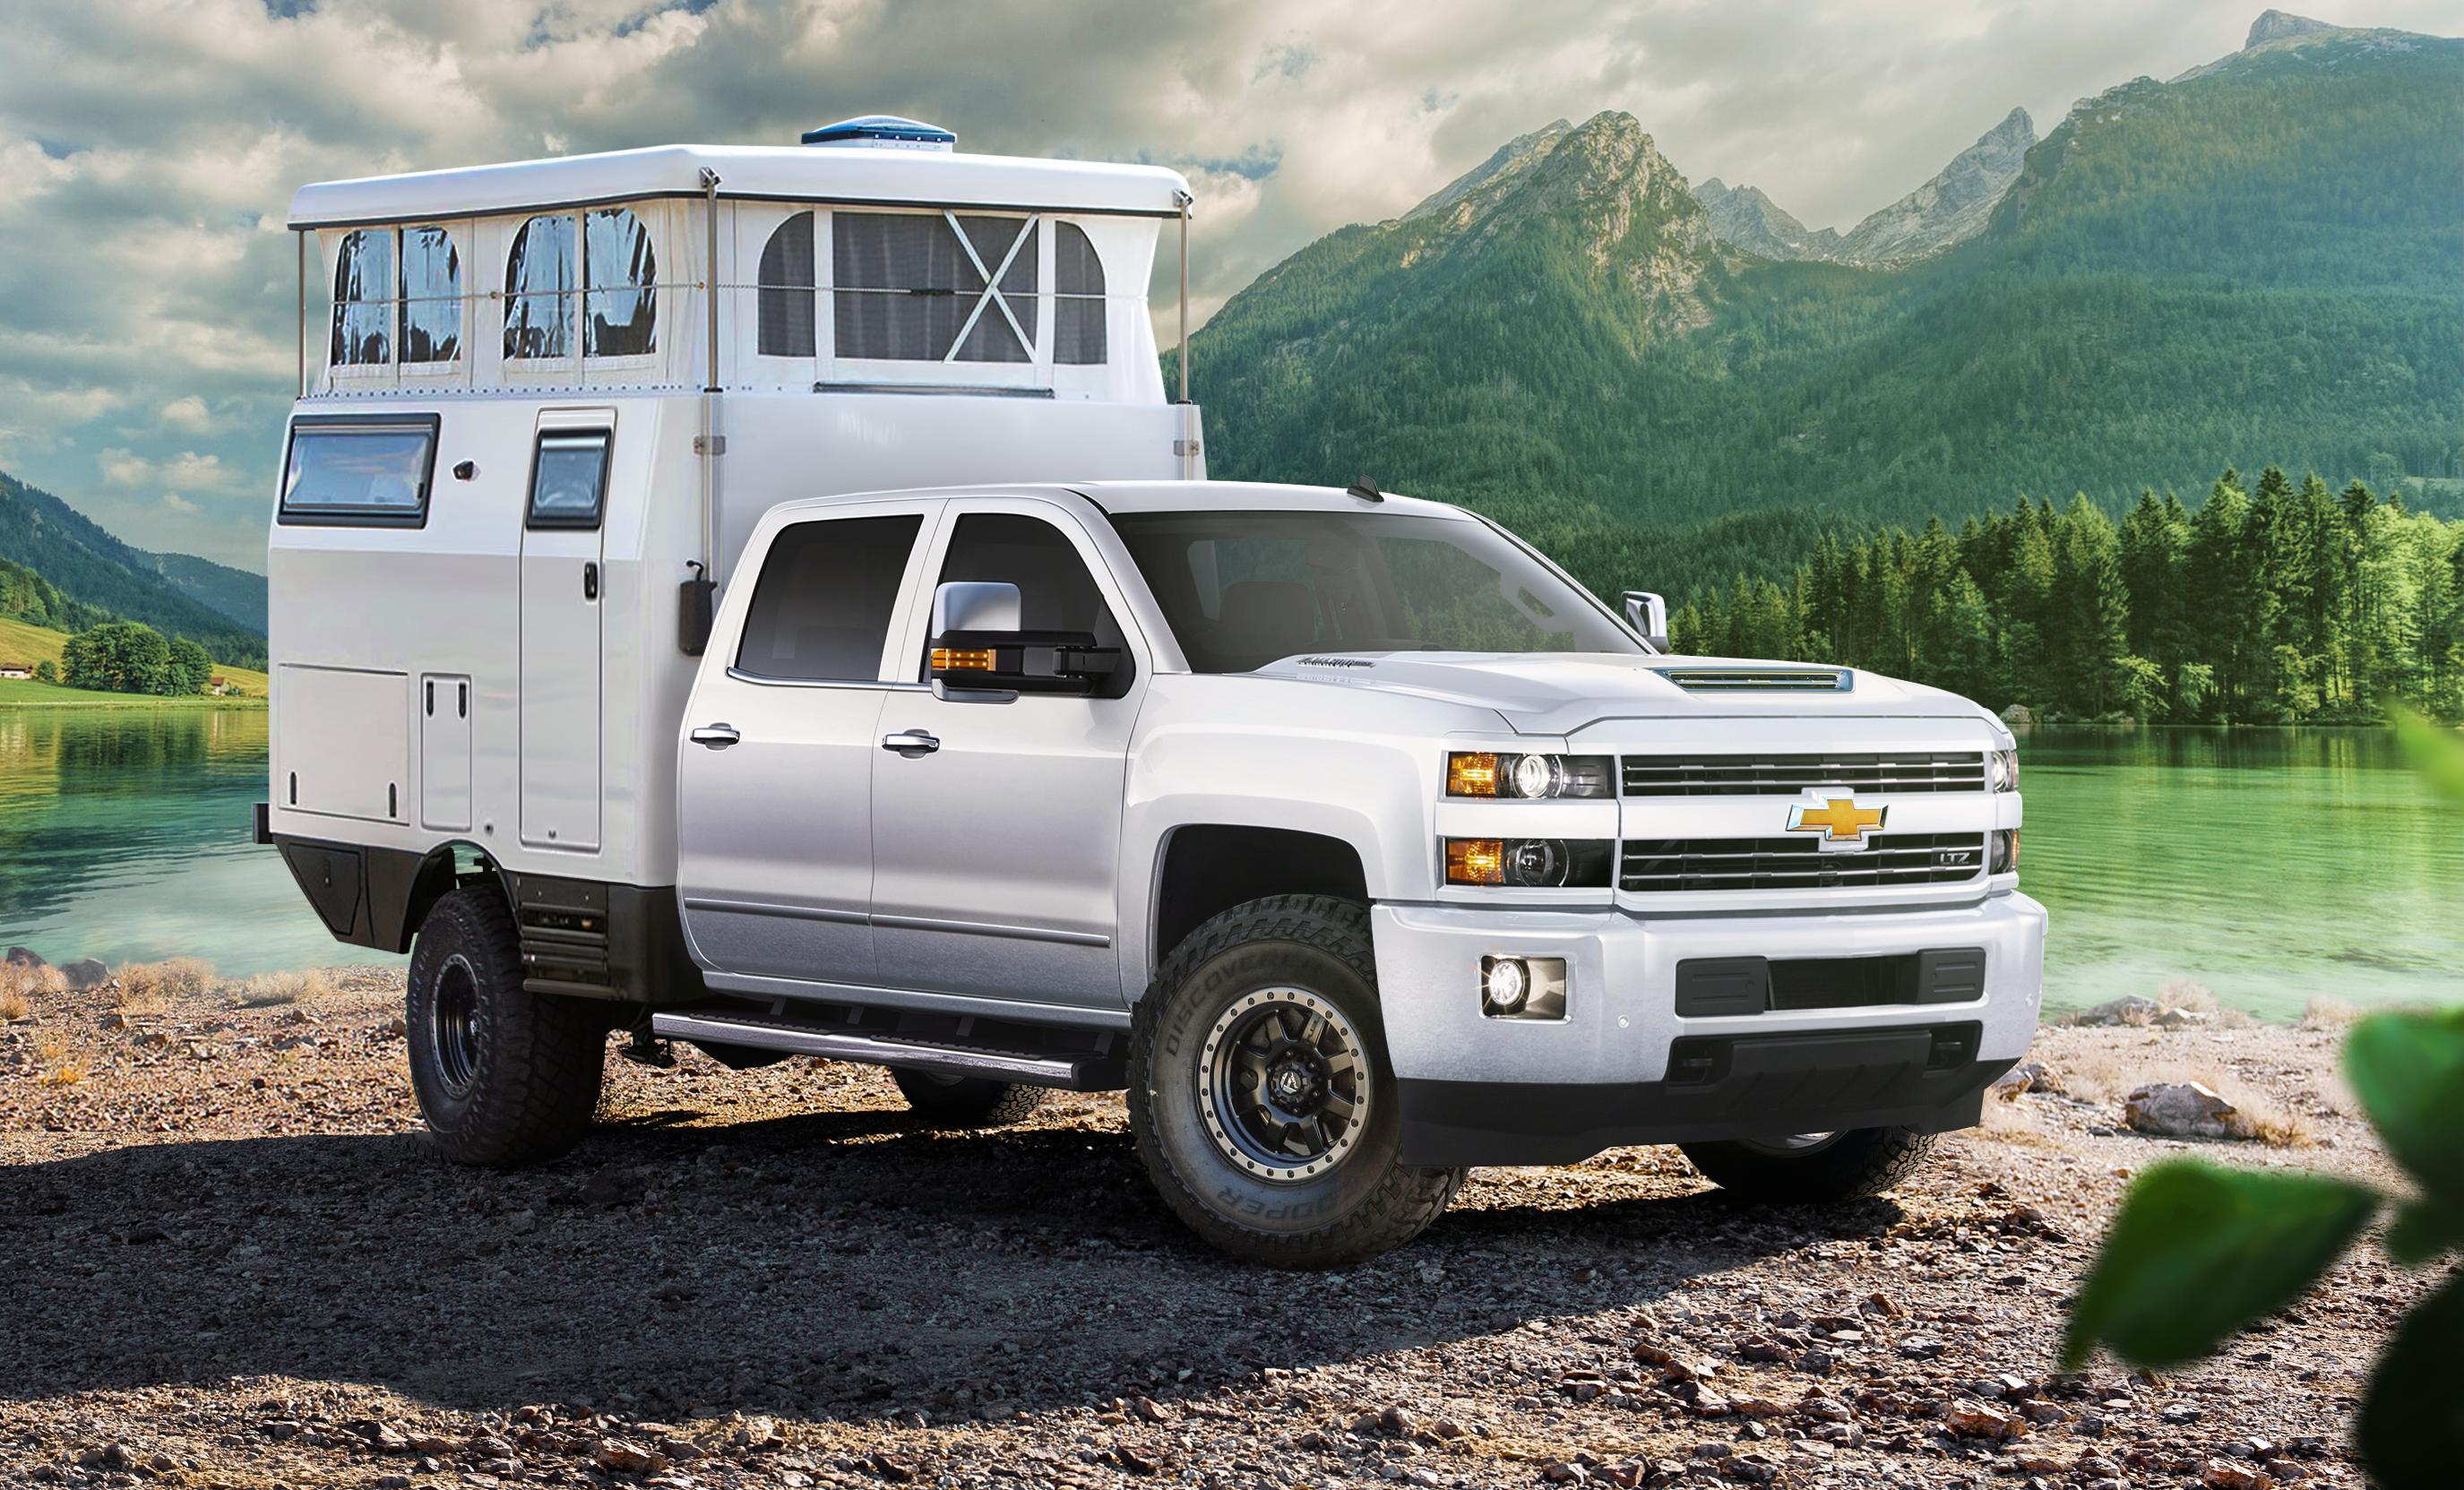 Rugged Off-Road Camper... trucks needed :)